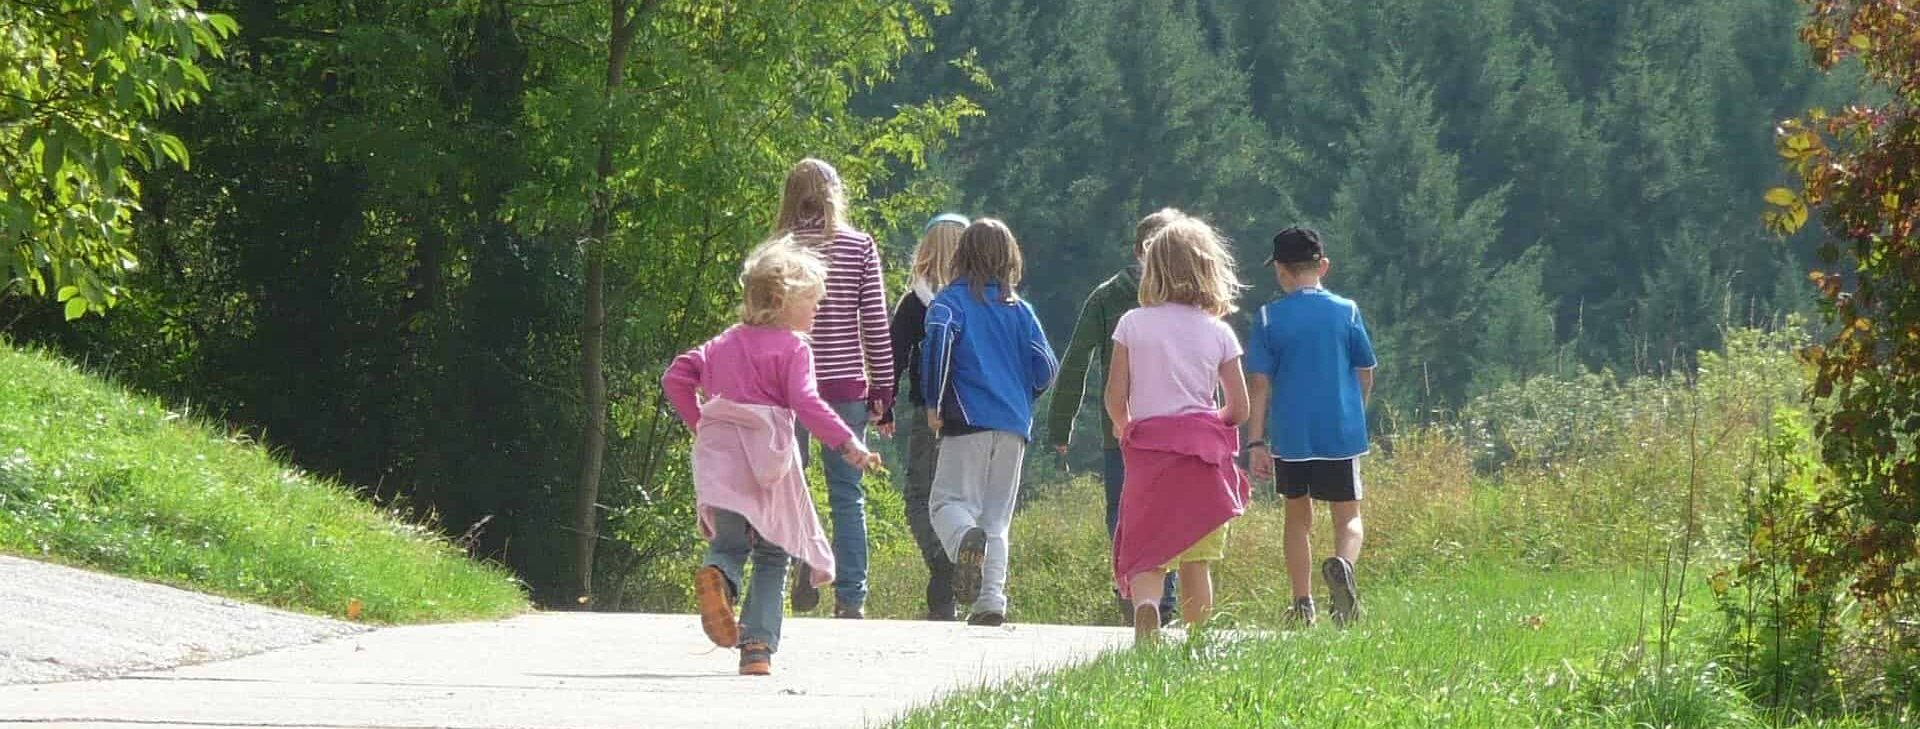 Natur Spaziergang Familie